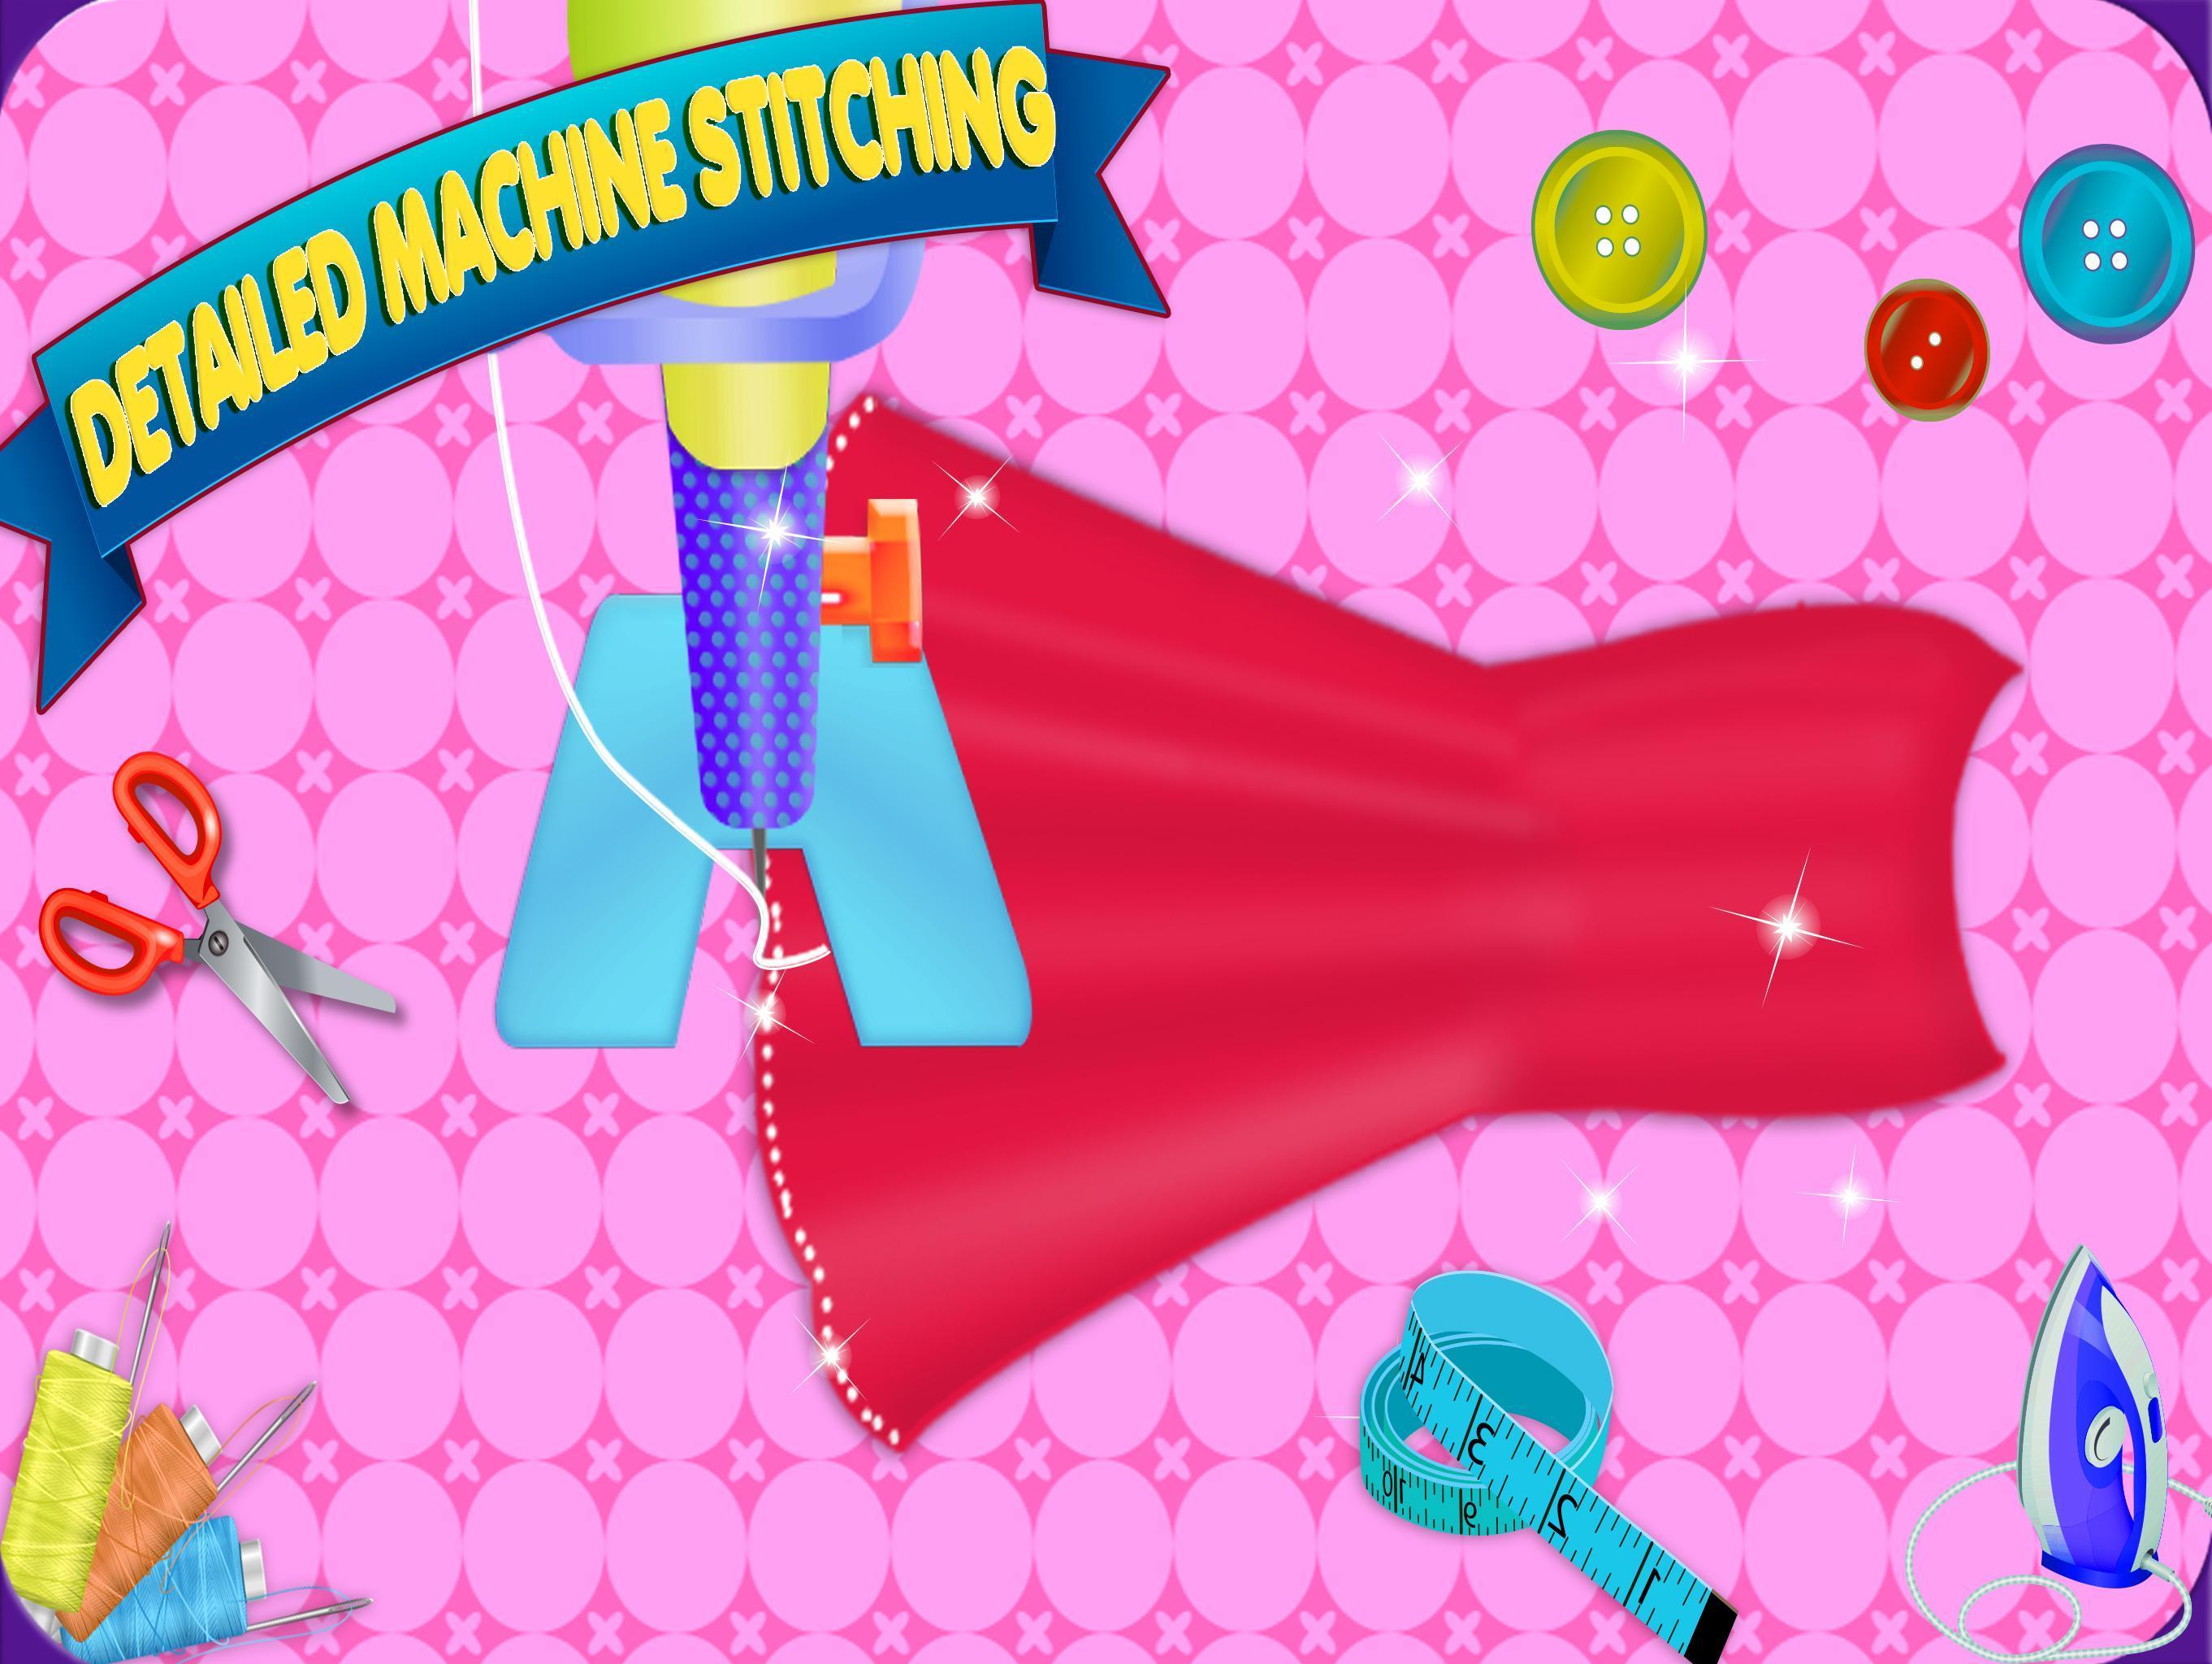 Indian Wedding Dress Tailor Little Style Boutique 1.0.4 Screenshot 14